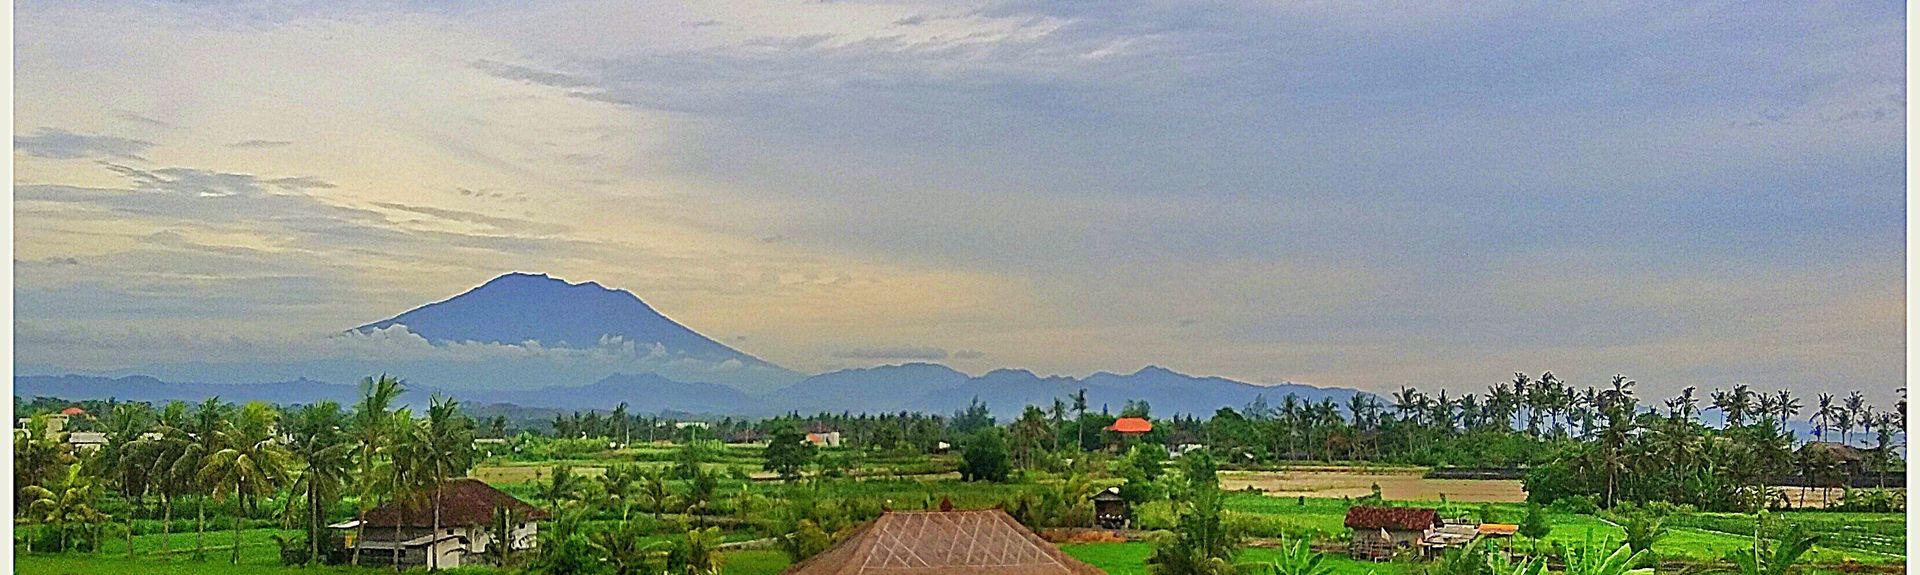 Sayan, Ubud, Bali, Indonesia